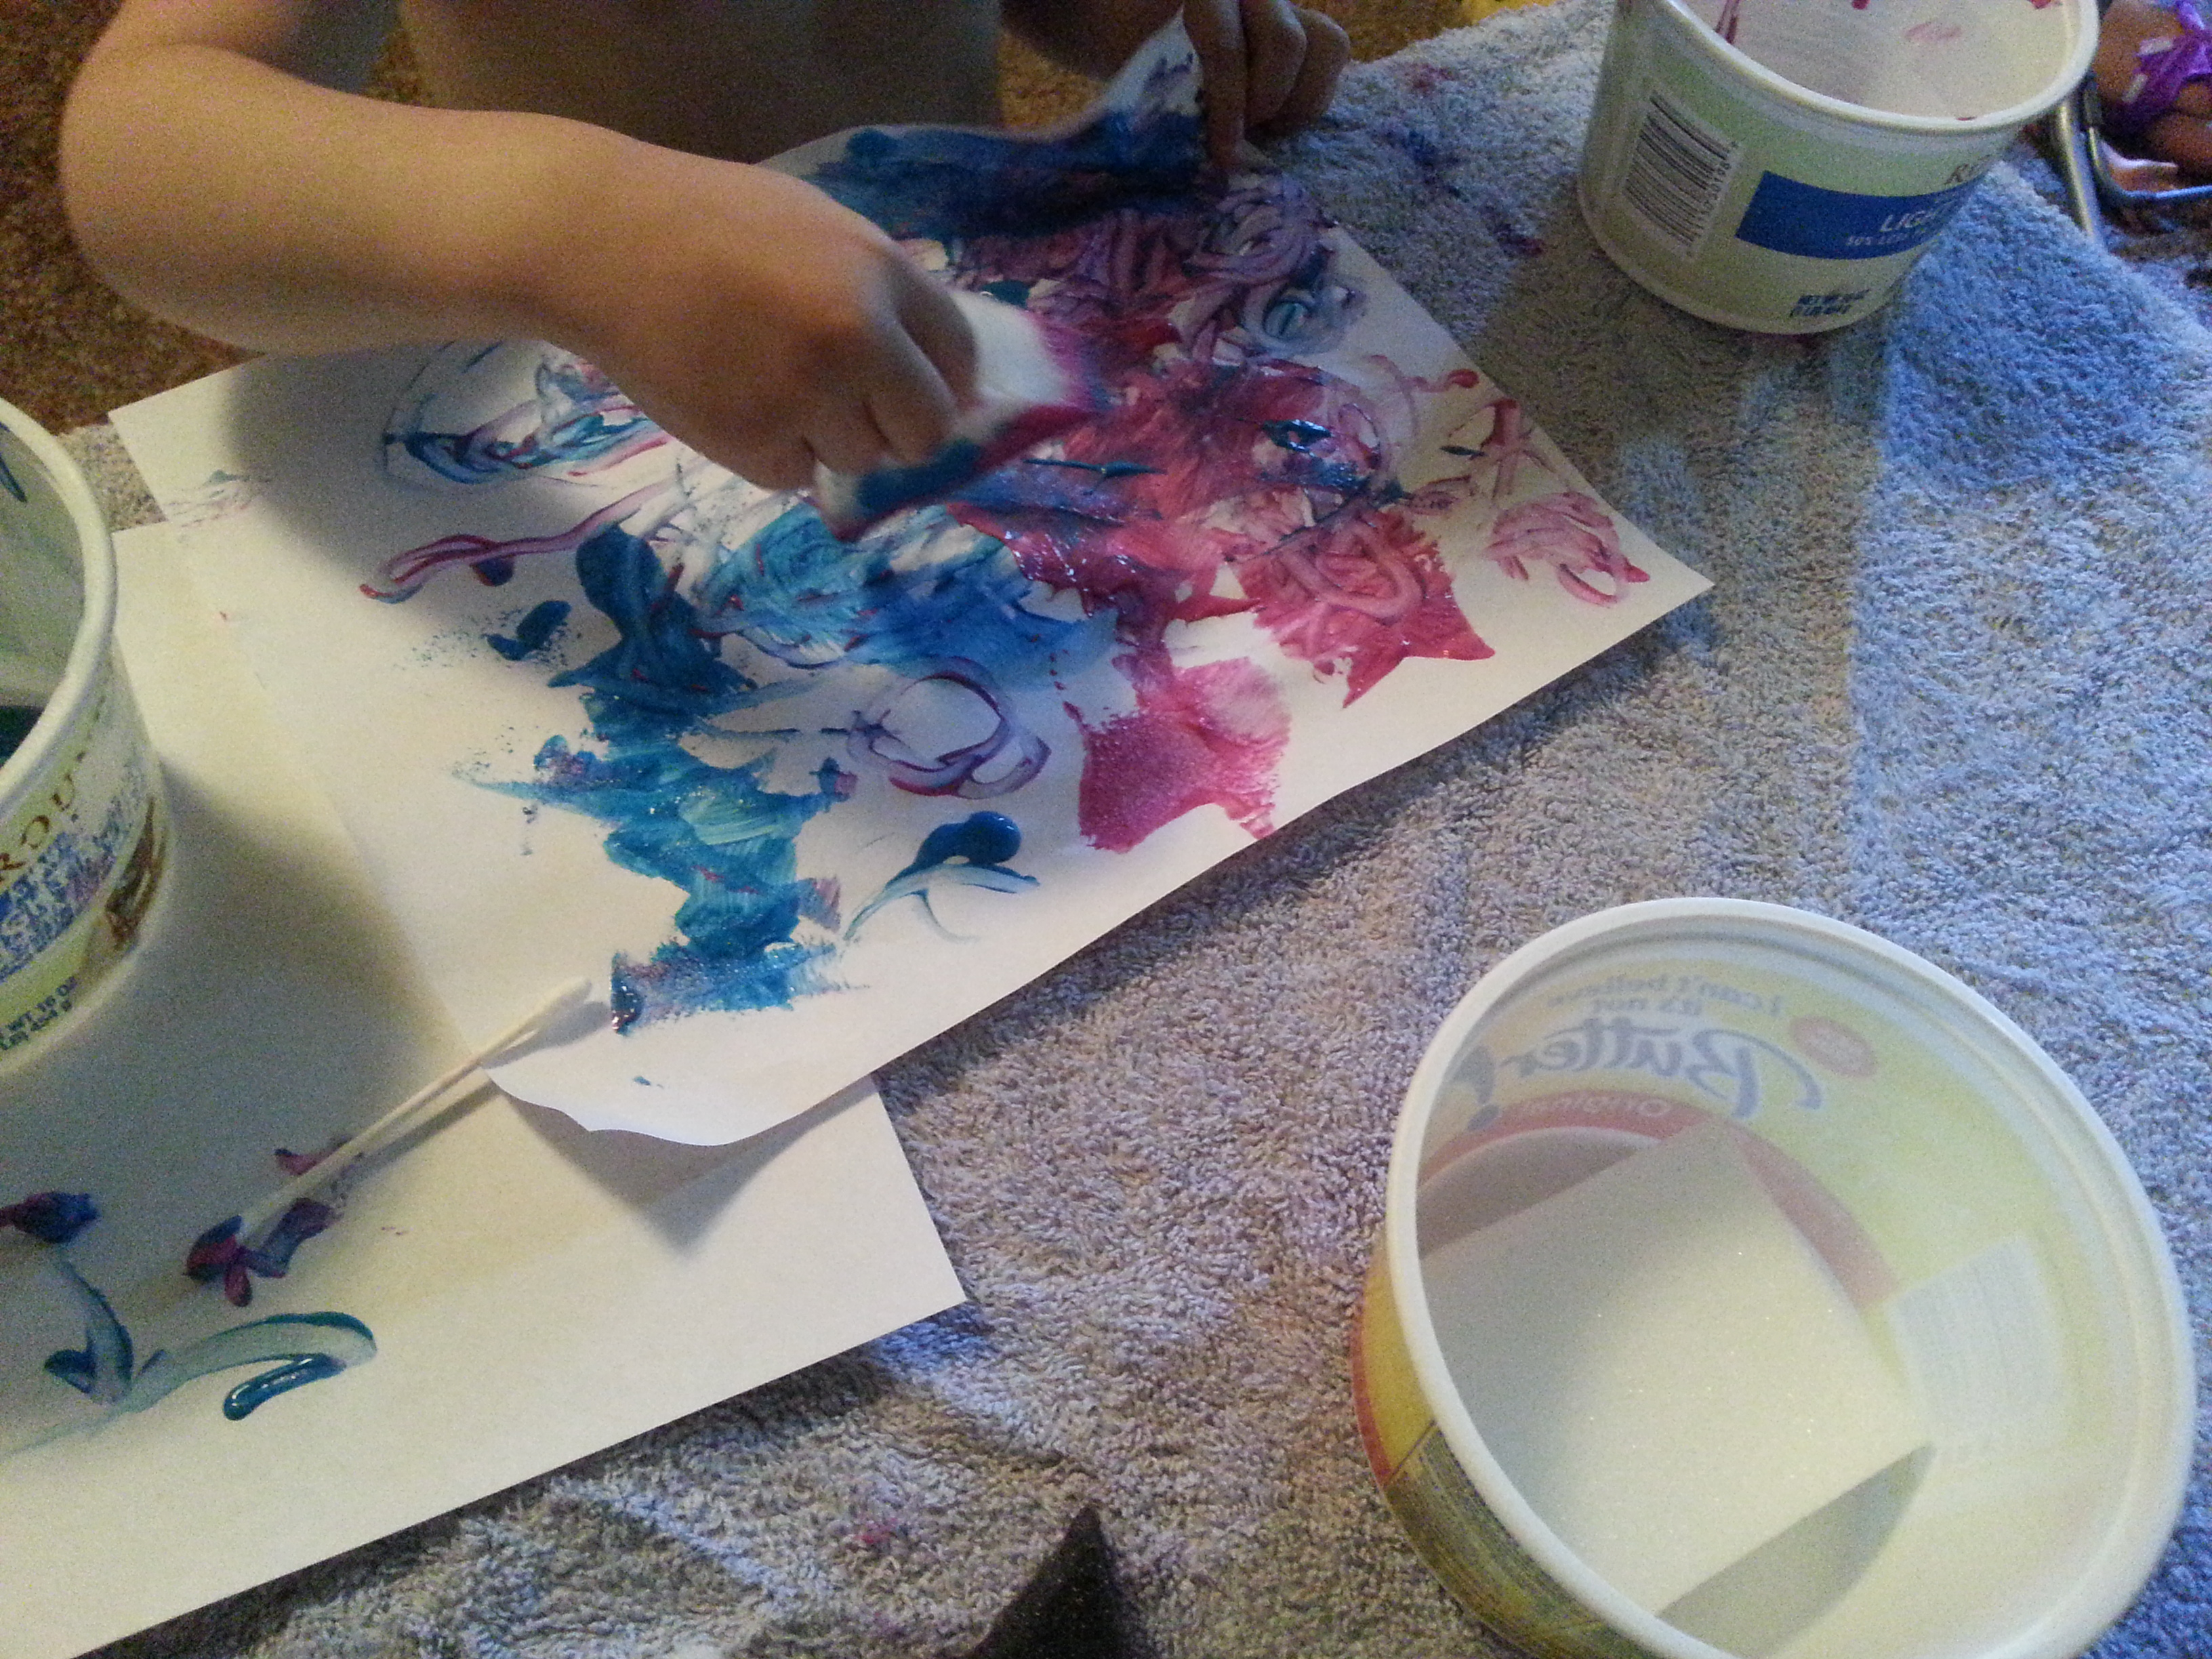 Sponge and cotton swab painting.